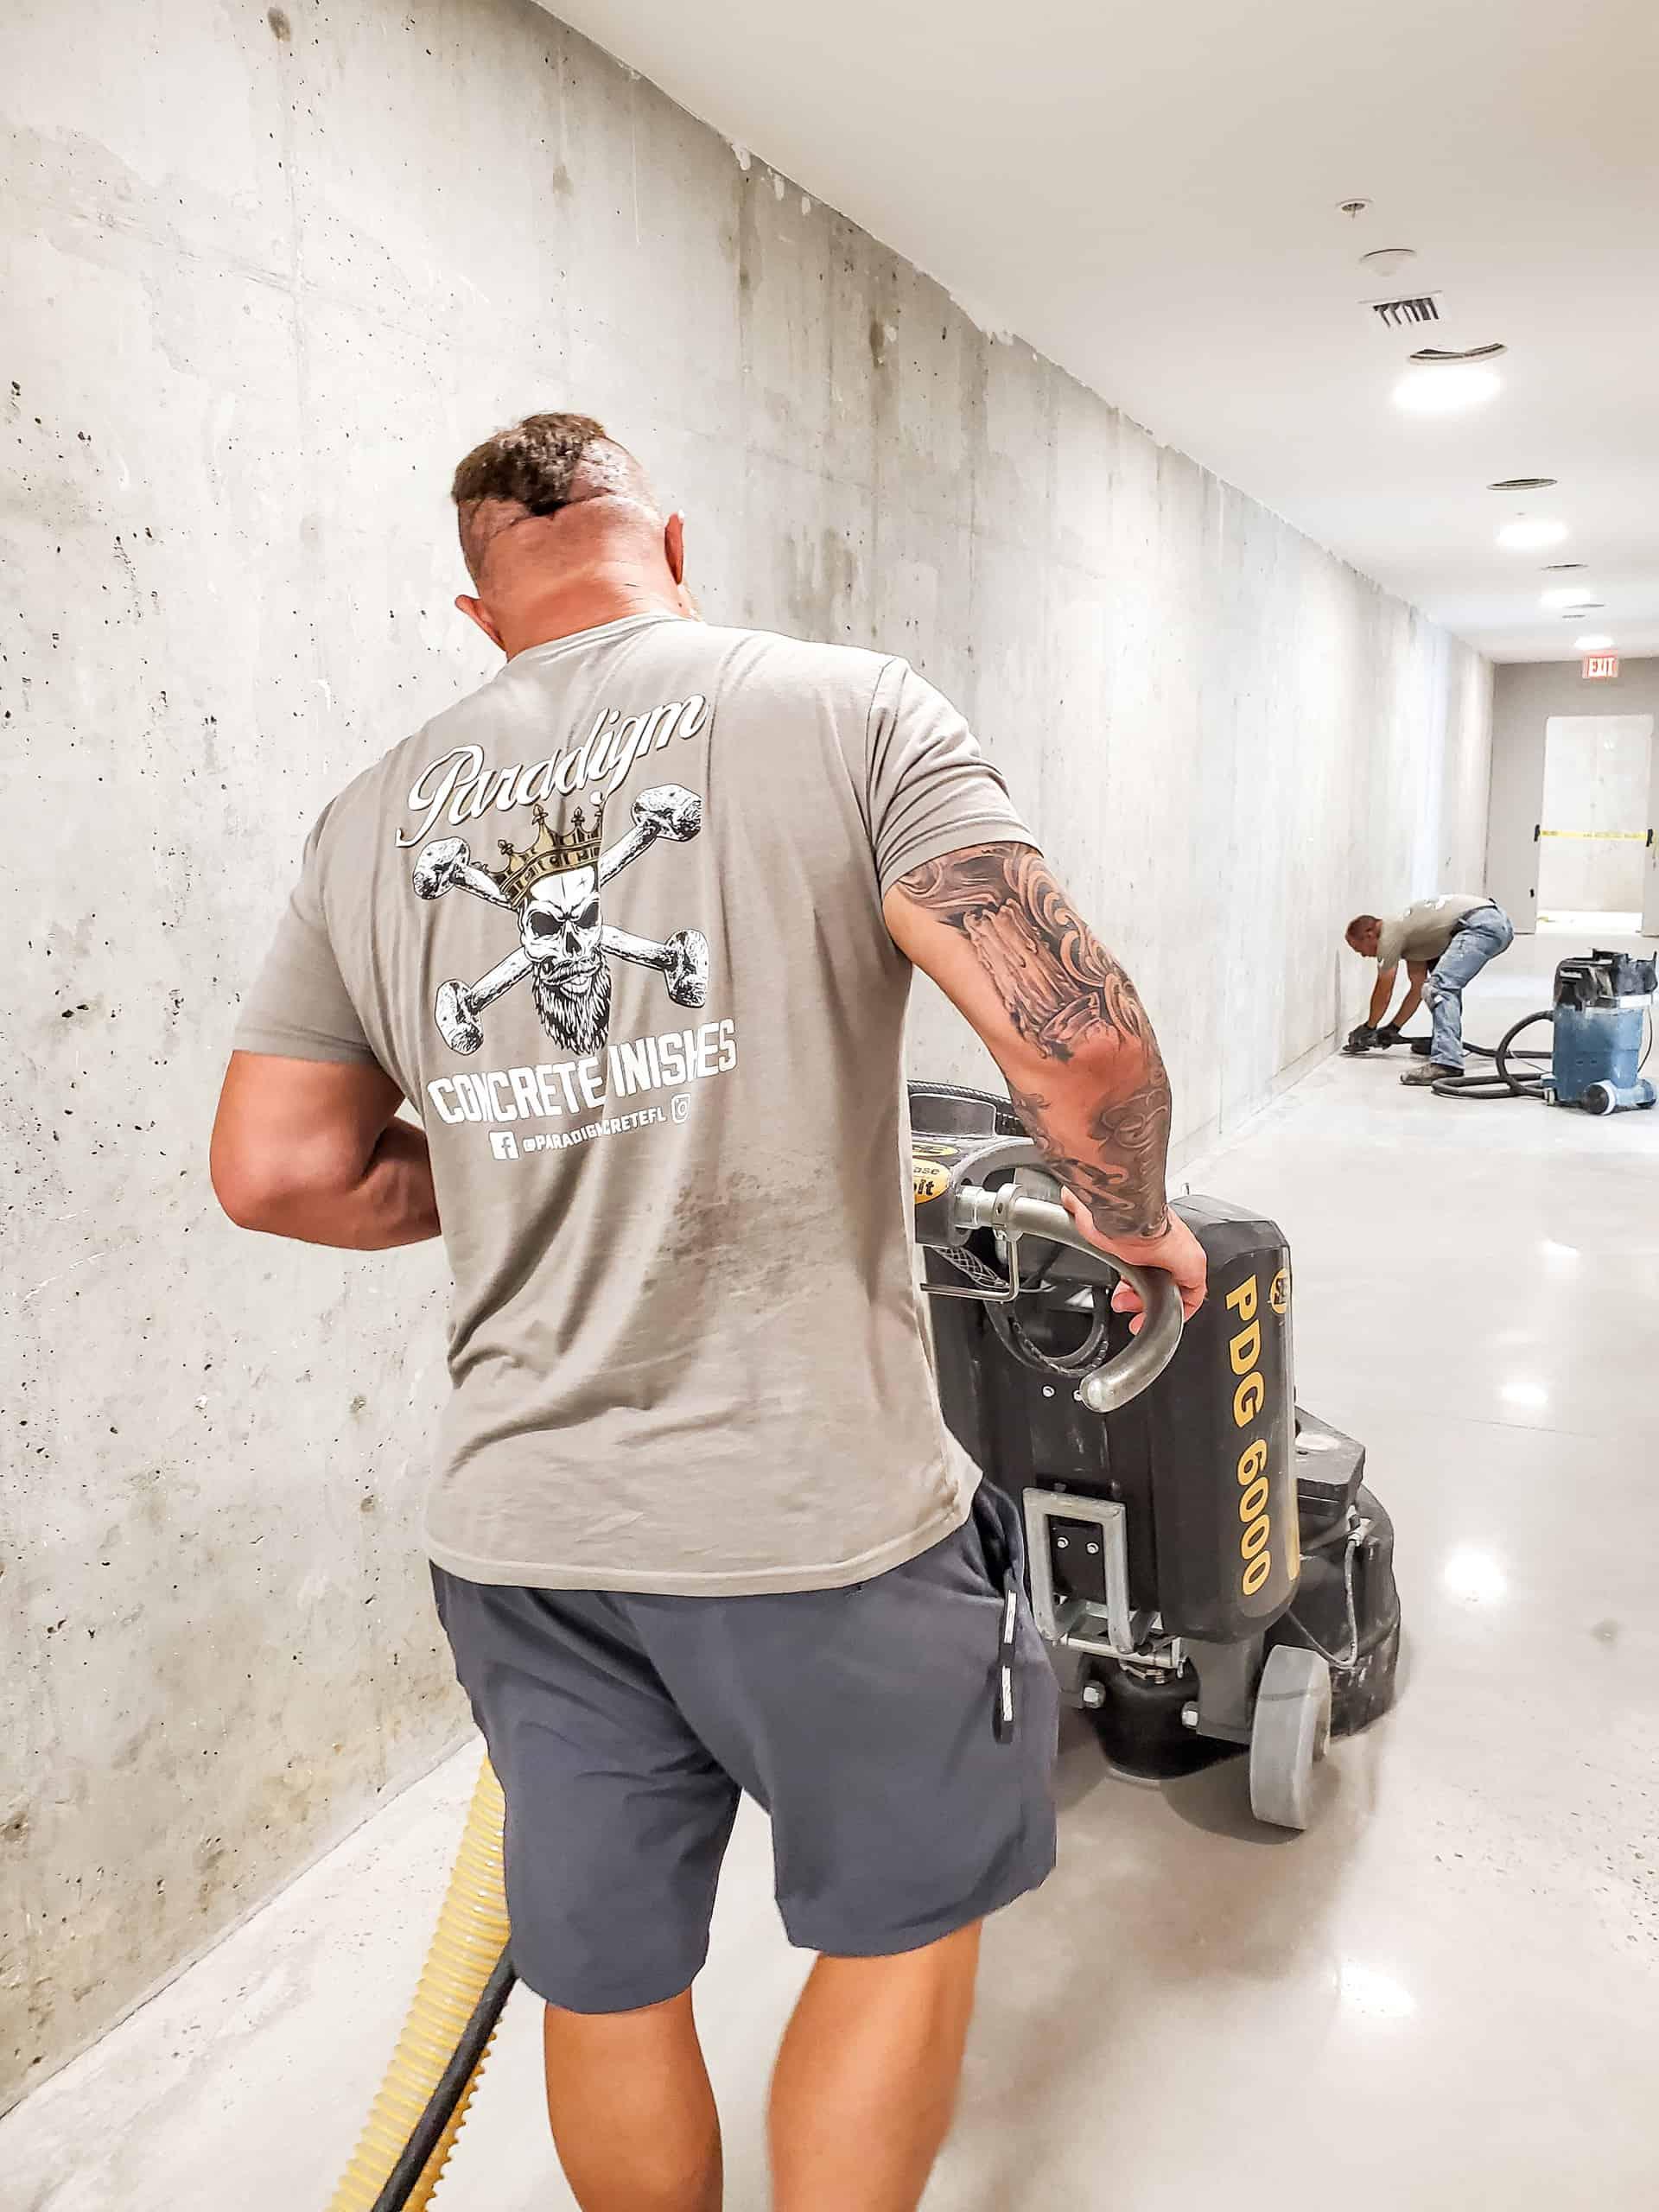 Jeremy the owner of Paradigm Concrete Finishes polishing the concrete floors